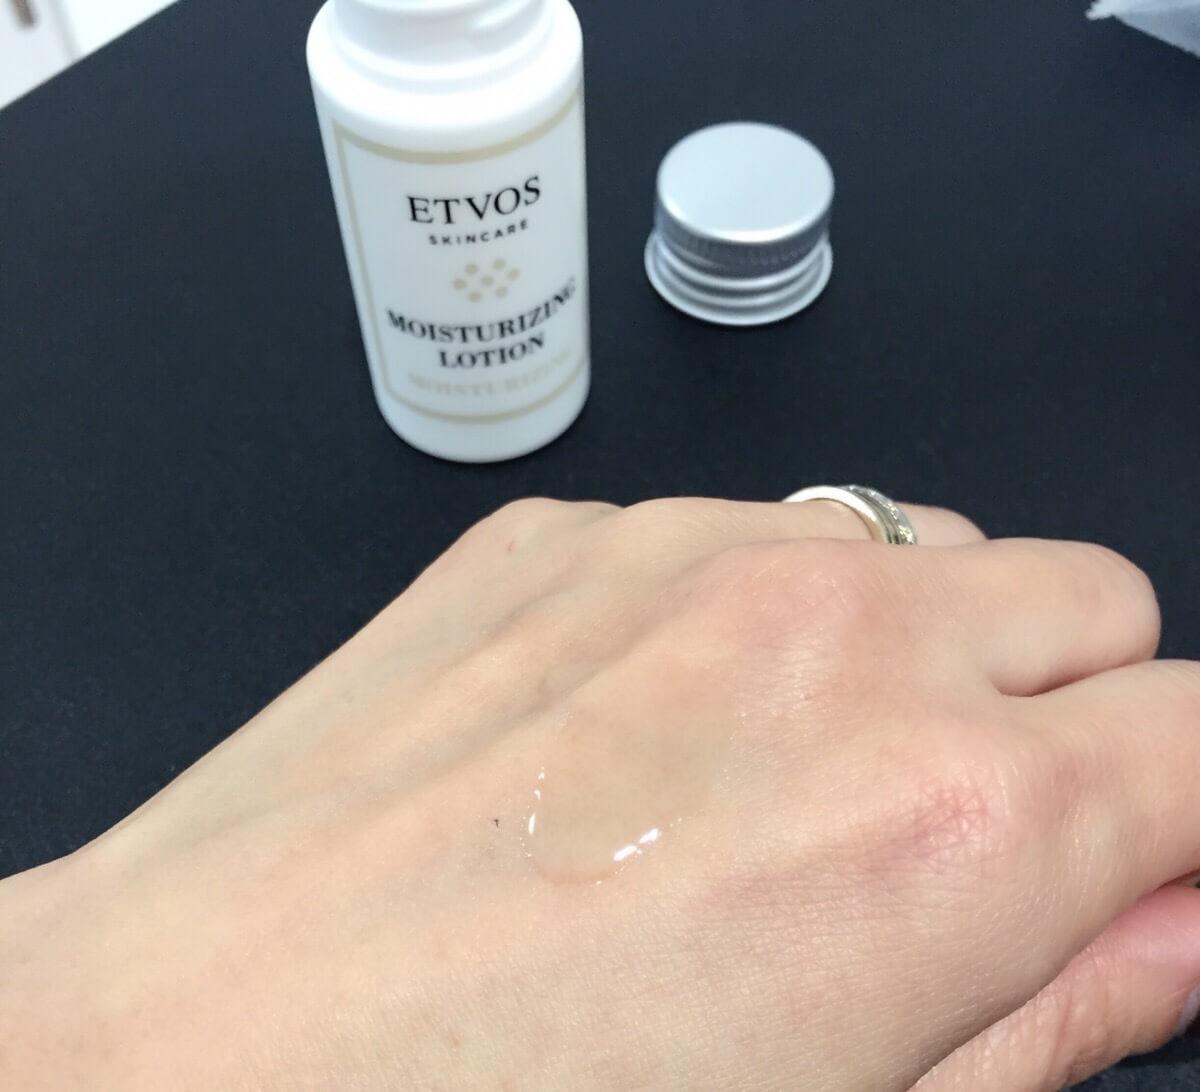 ETVOSトライアル化粧水テクスチャ